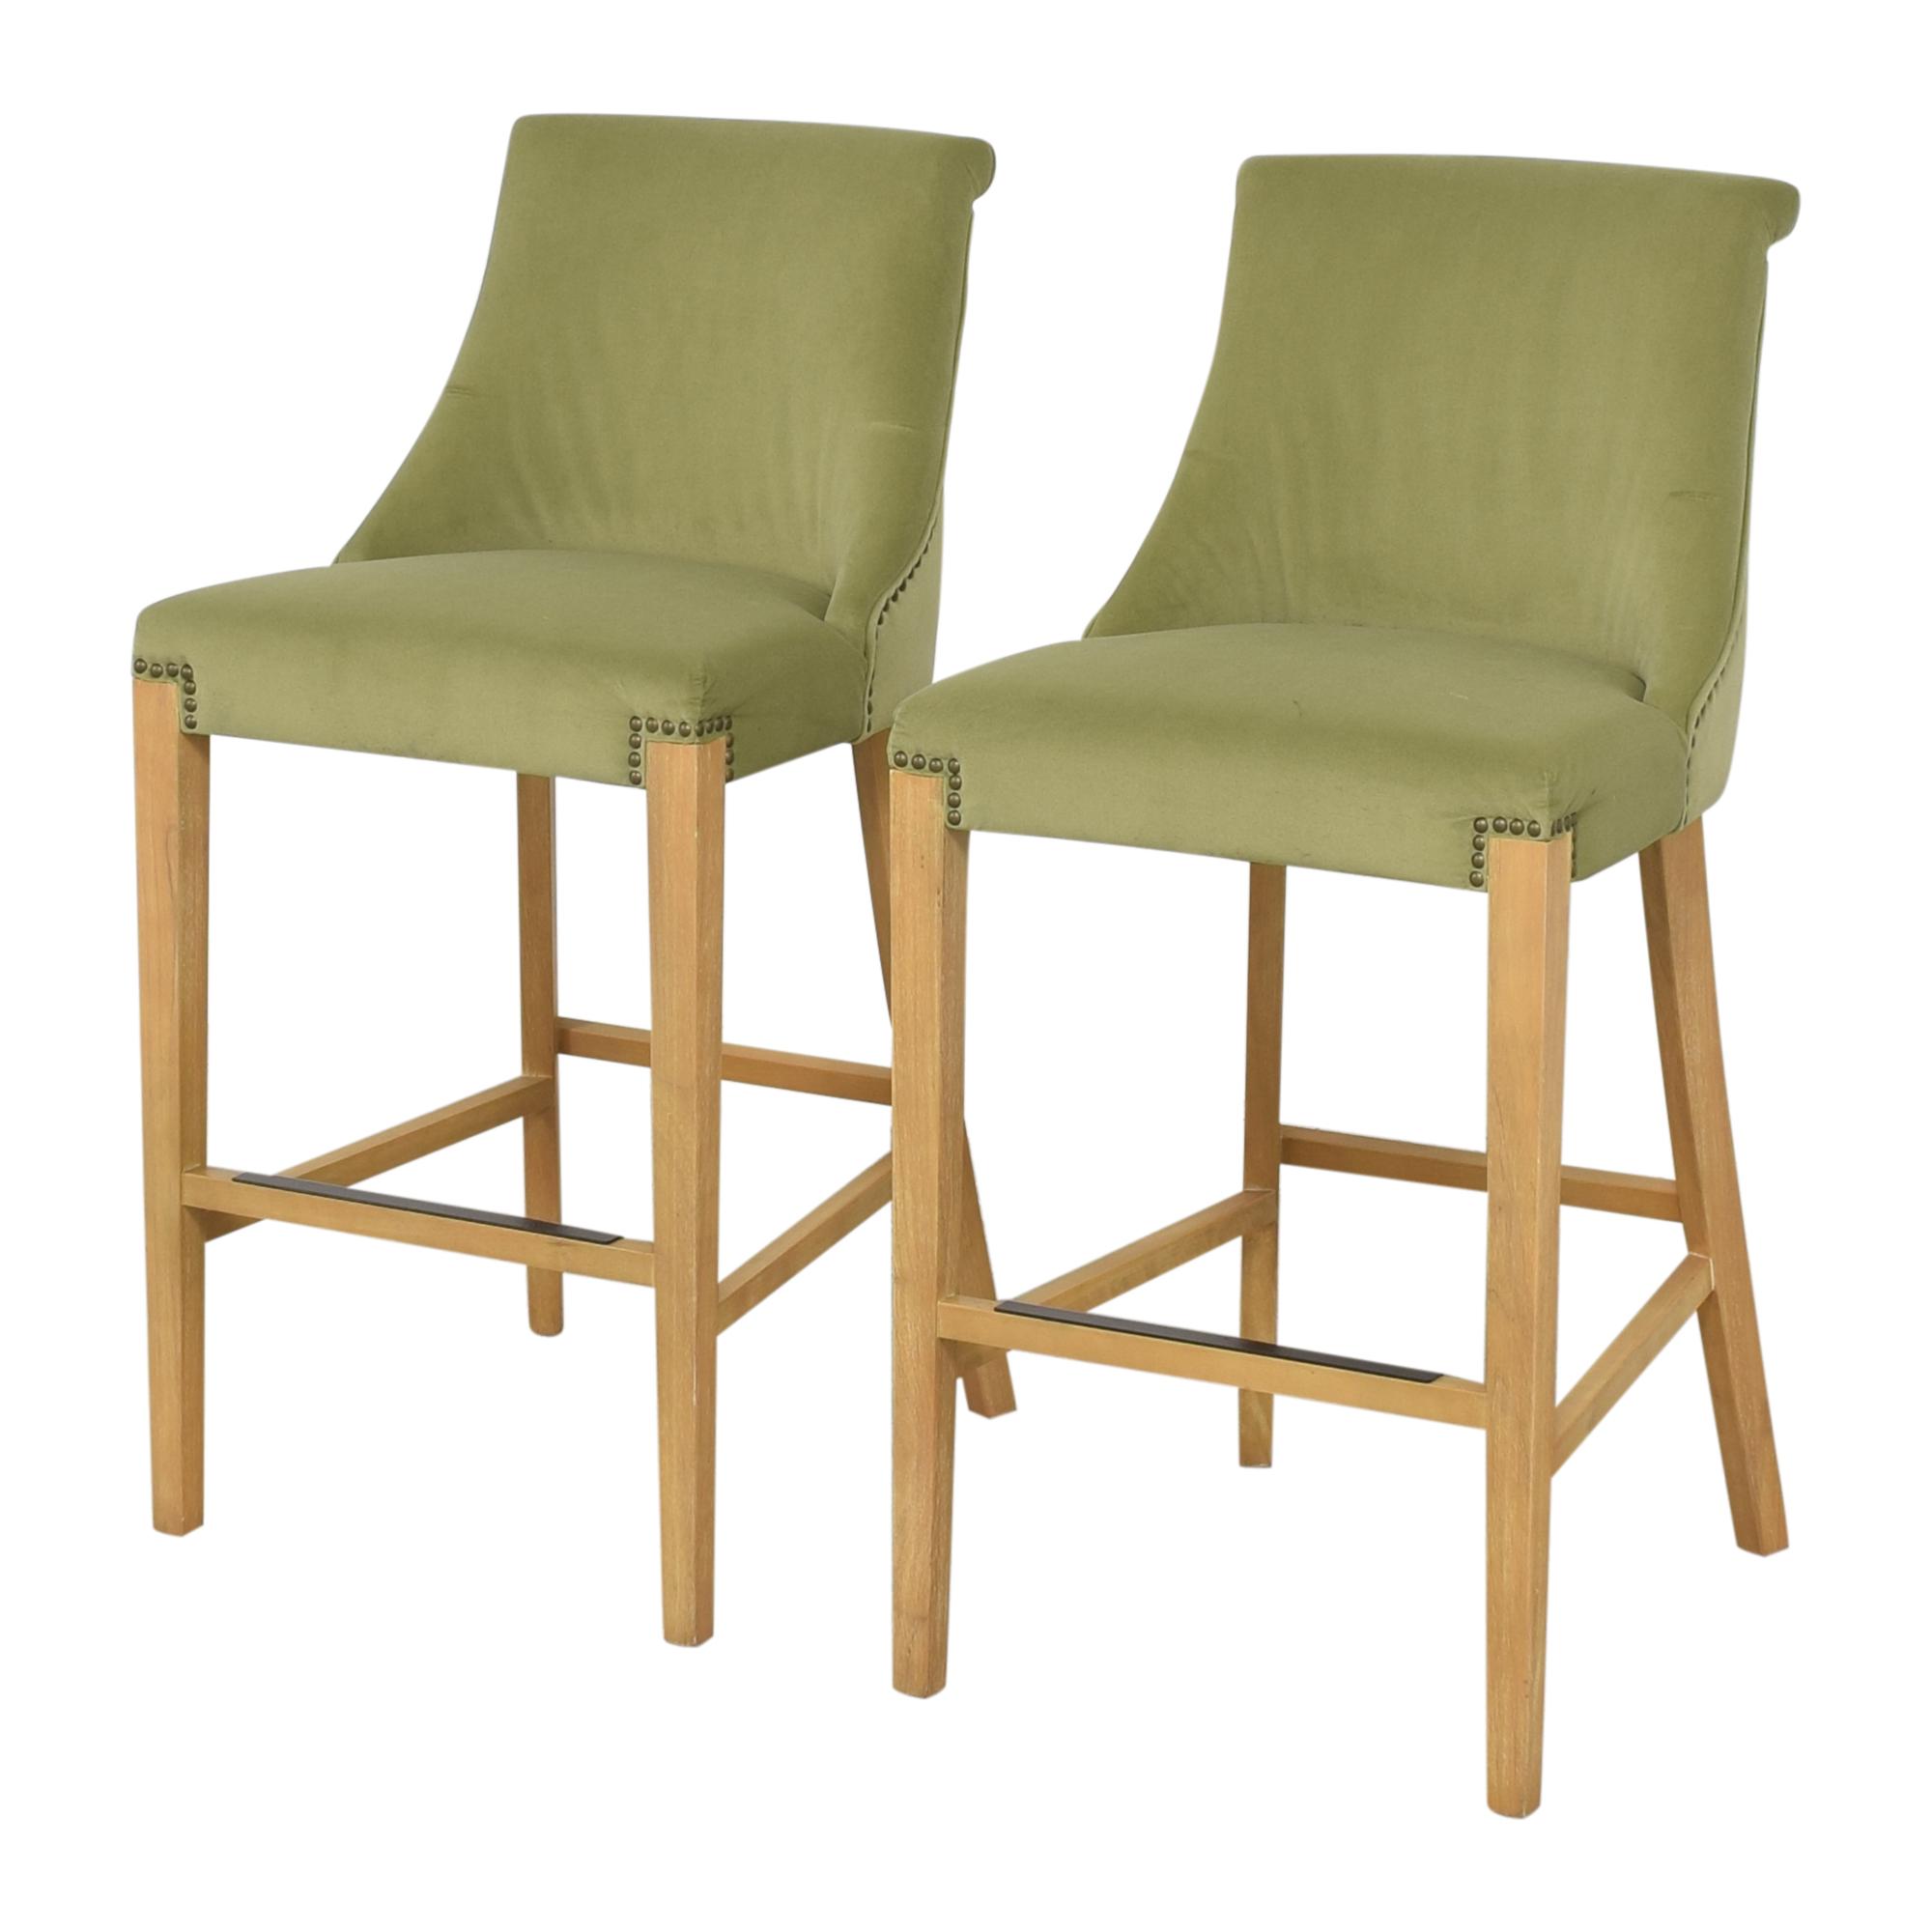 shop Jason Furniture Jason Furniture Nailhead Trim Bar Stools online